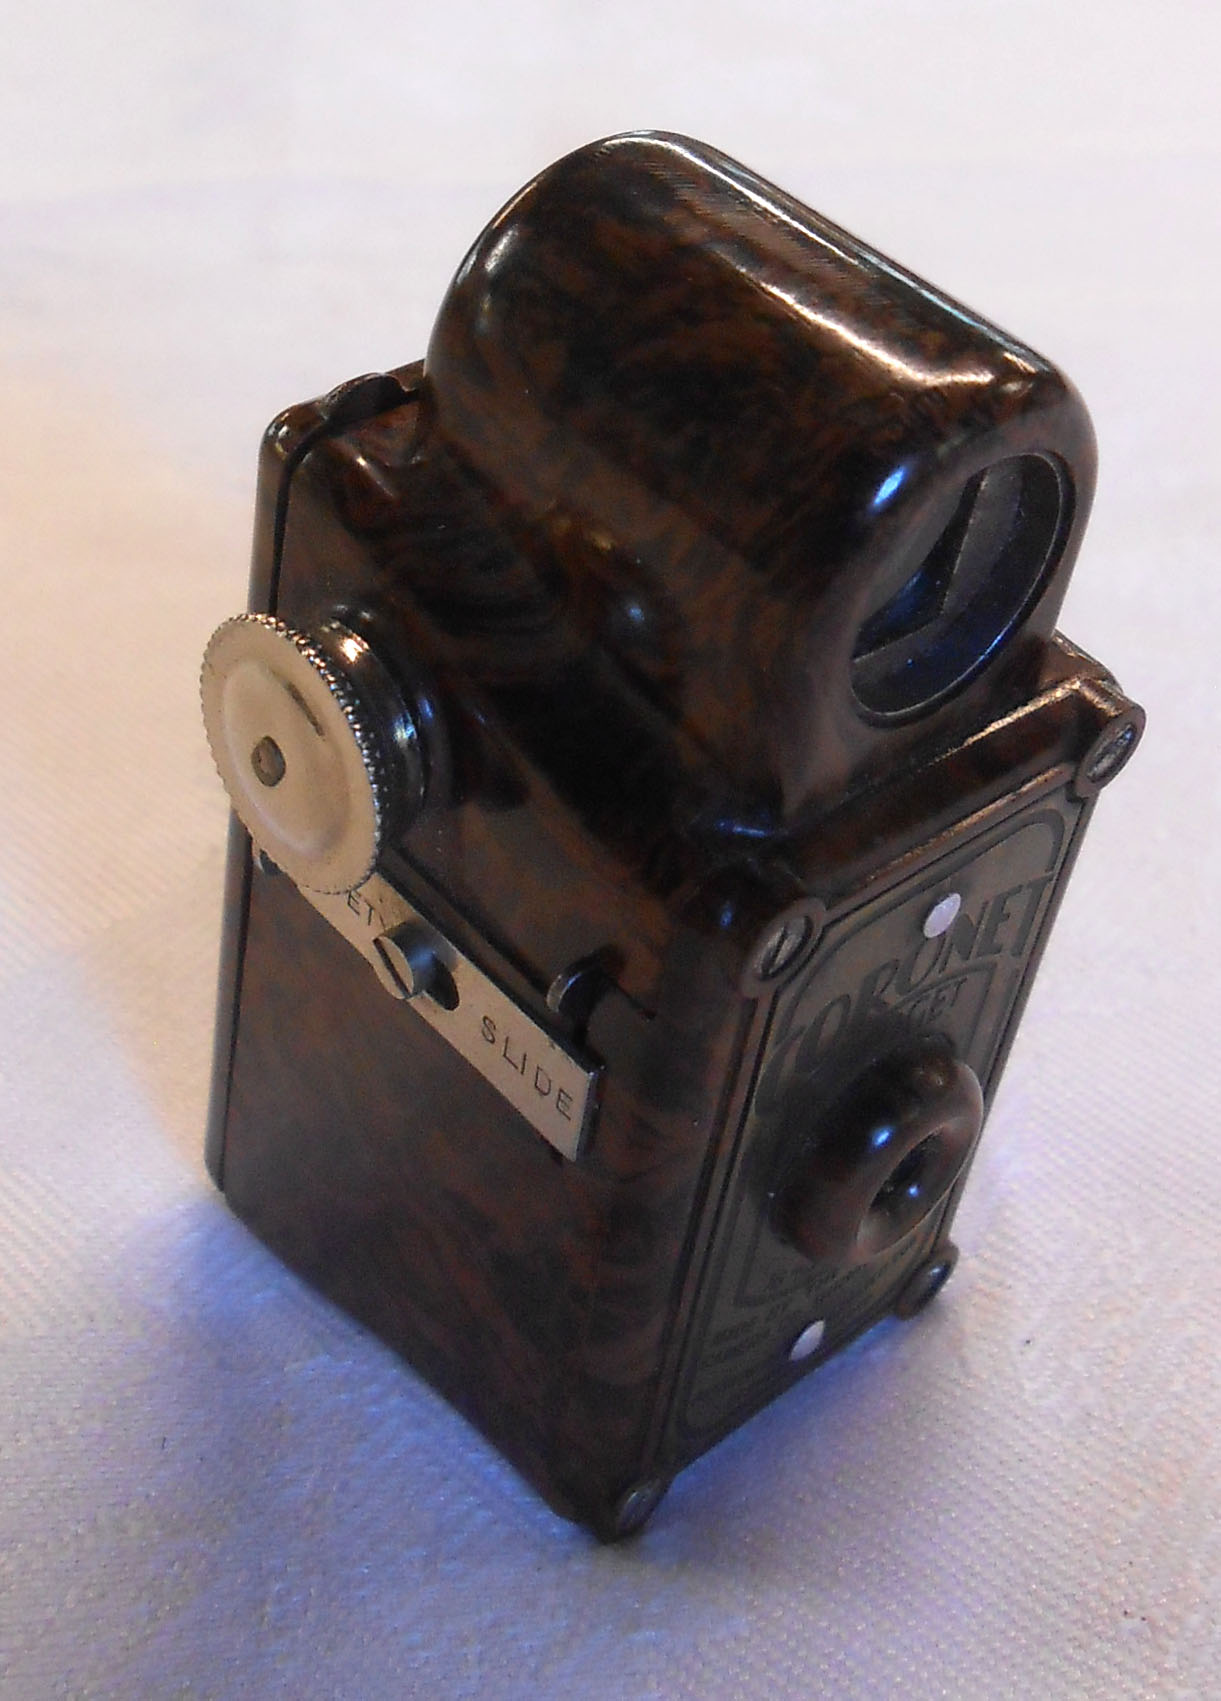 A vintage Coronet Midget miniature camera with brown Bakelite case - Image 2 of 2